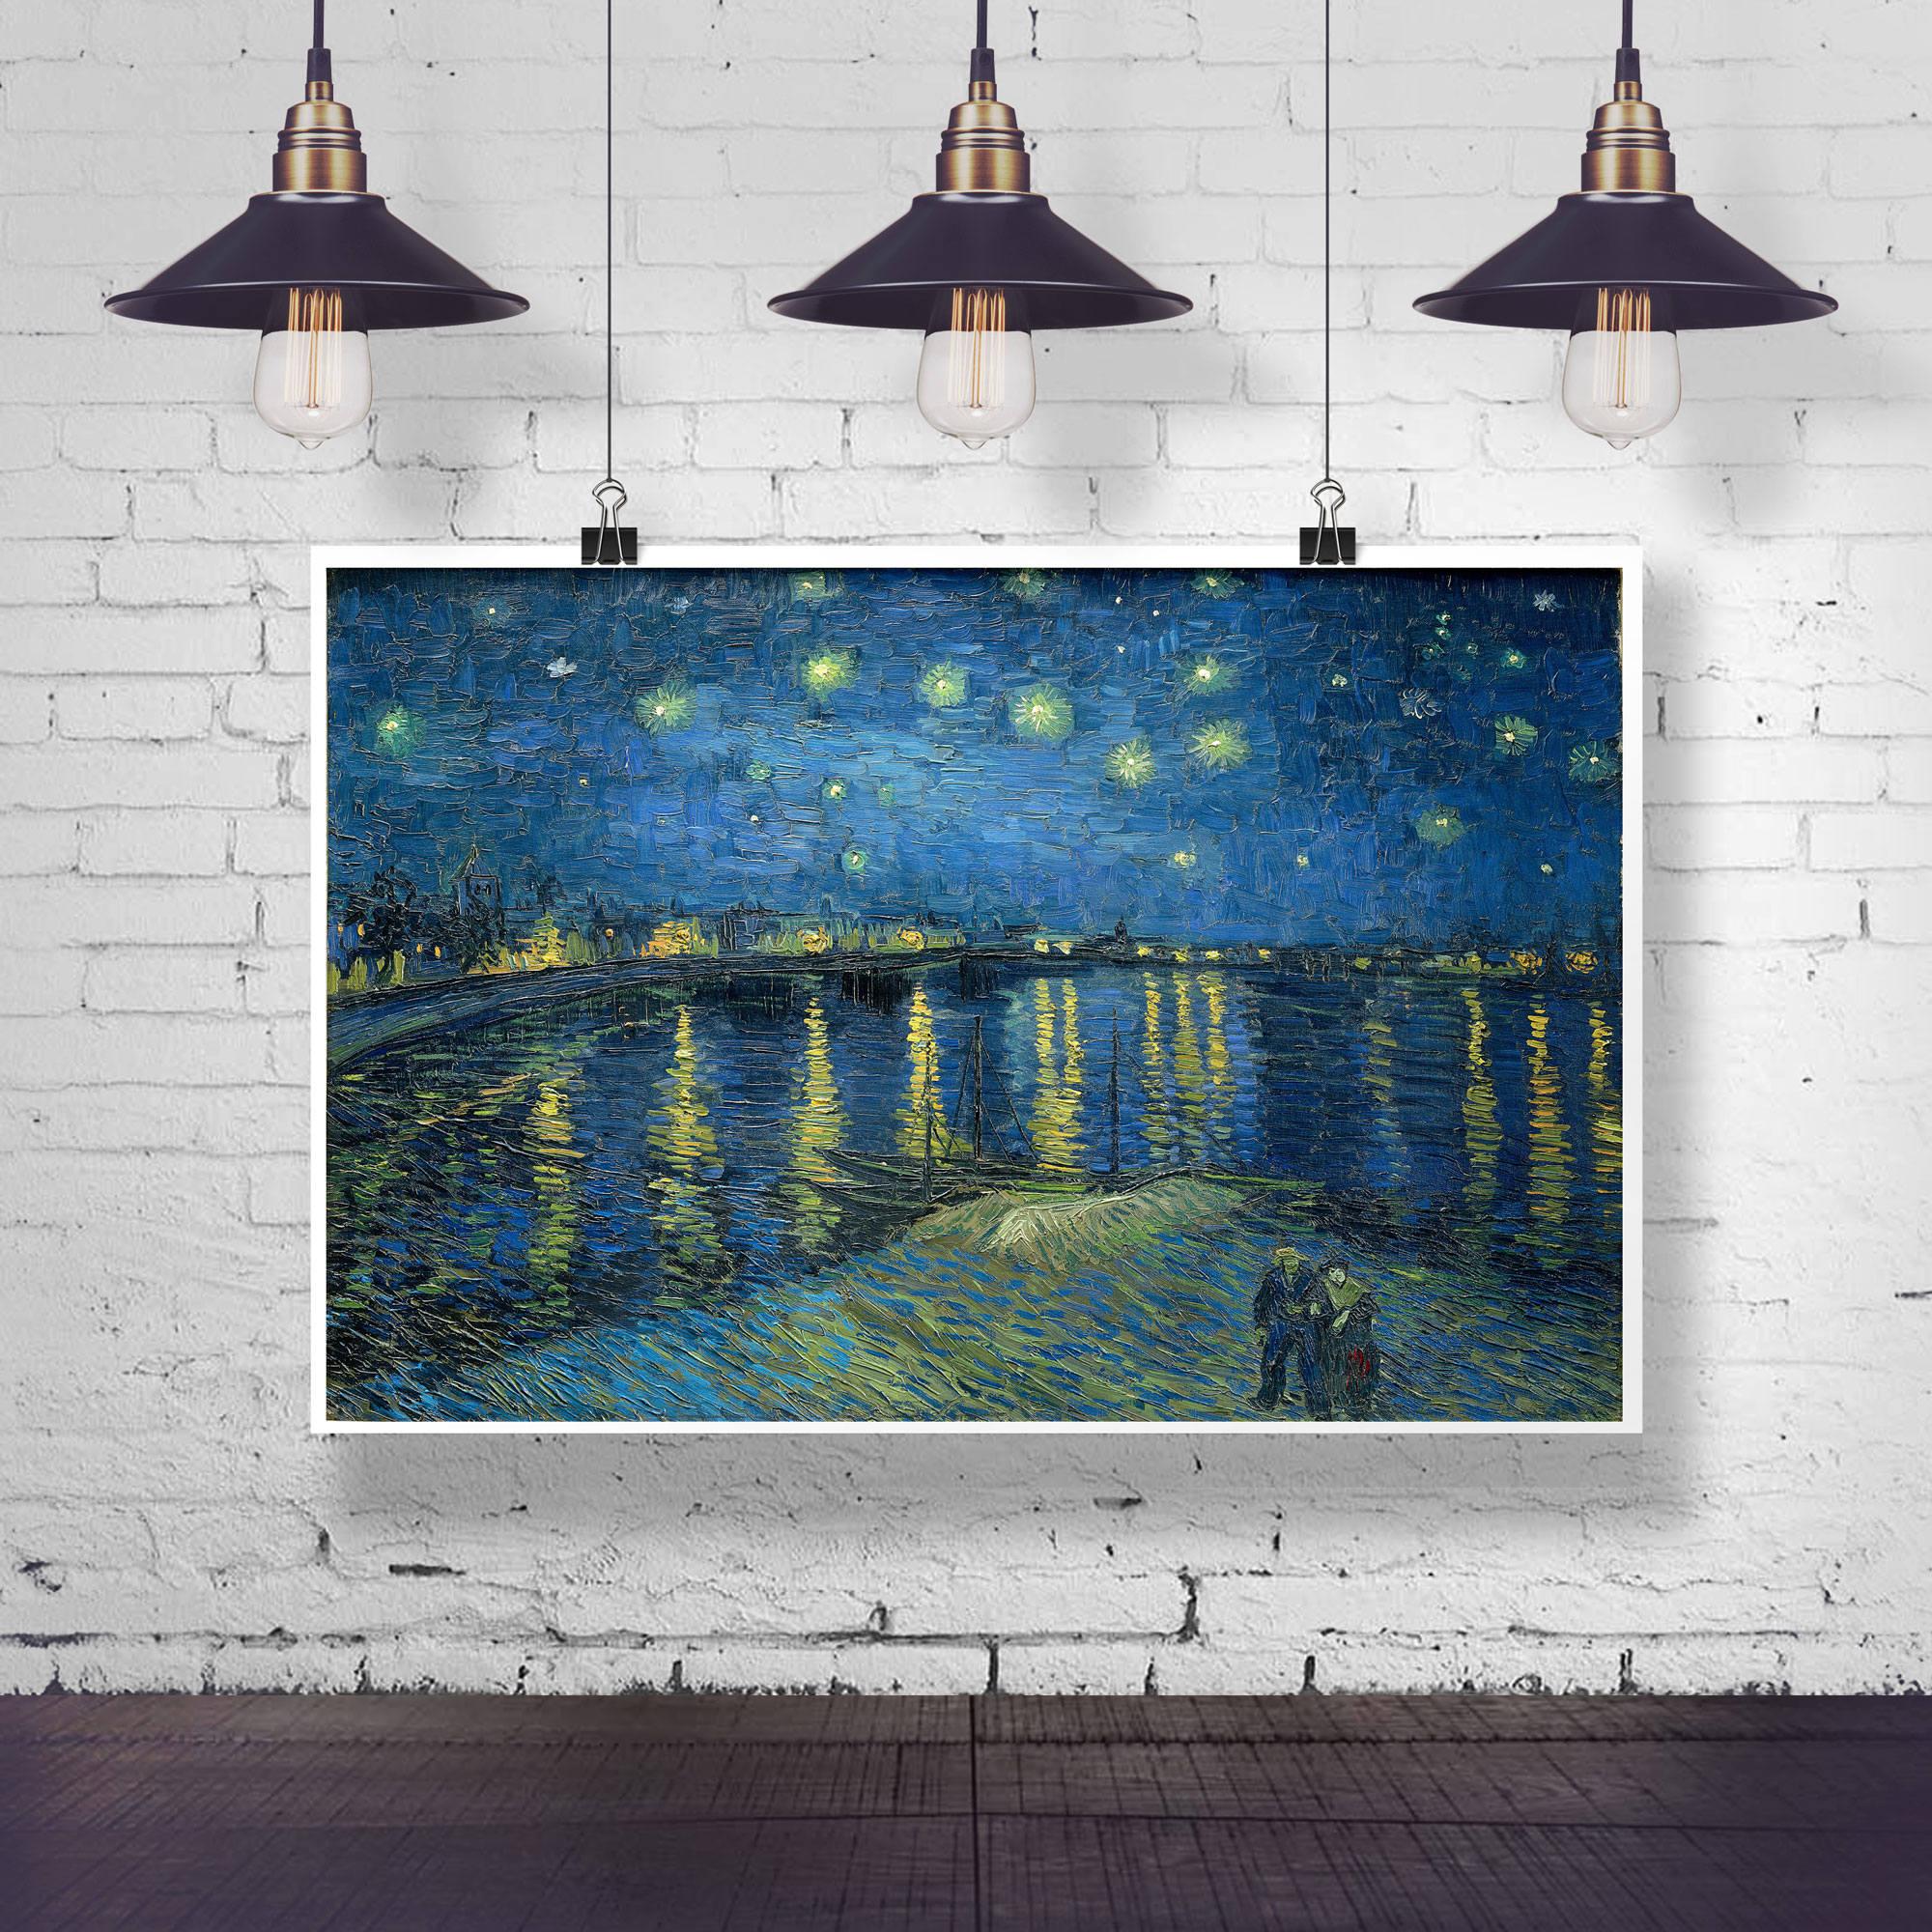 Starry Night Over The Rhone by Vincent Van Gogh Painting Van Gogh Wall Art Starry Night Painting Starry Night Wall Art Large painting Decor & Starry Night Over The Rhone by Vincent Van Gogh Painting Van Gogh ...